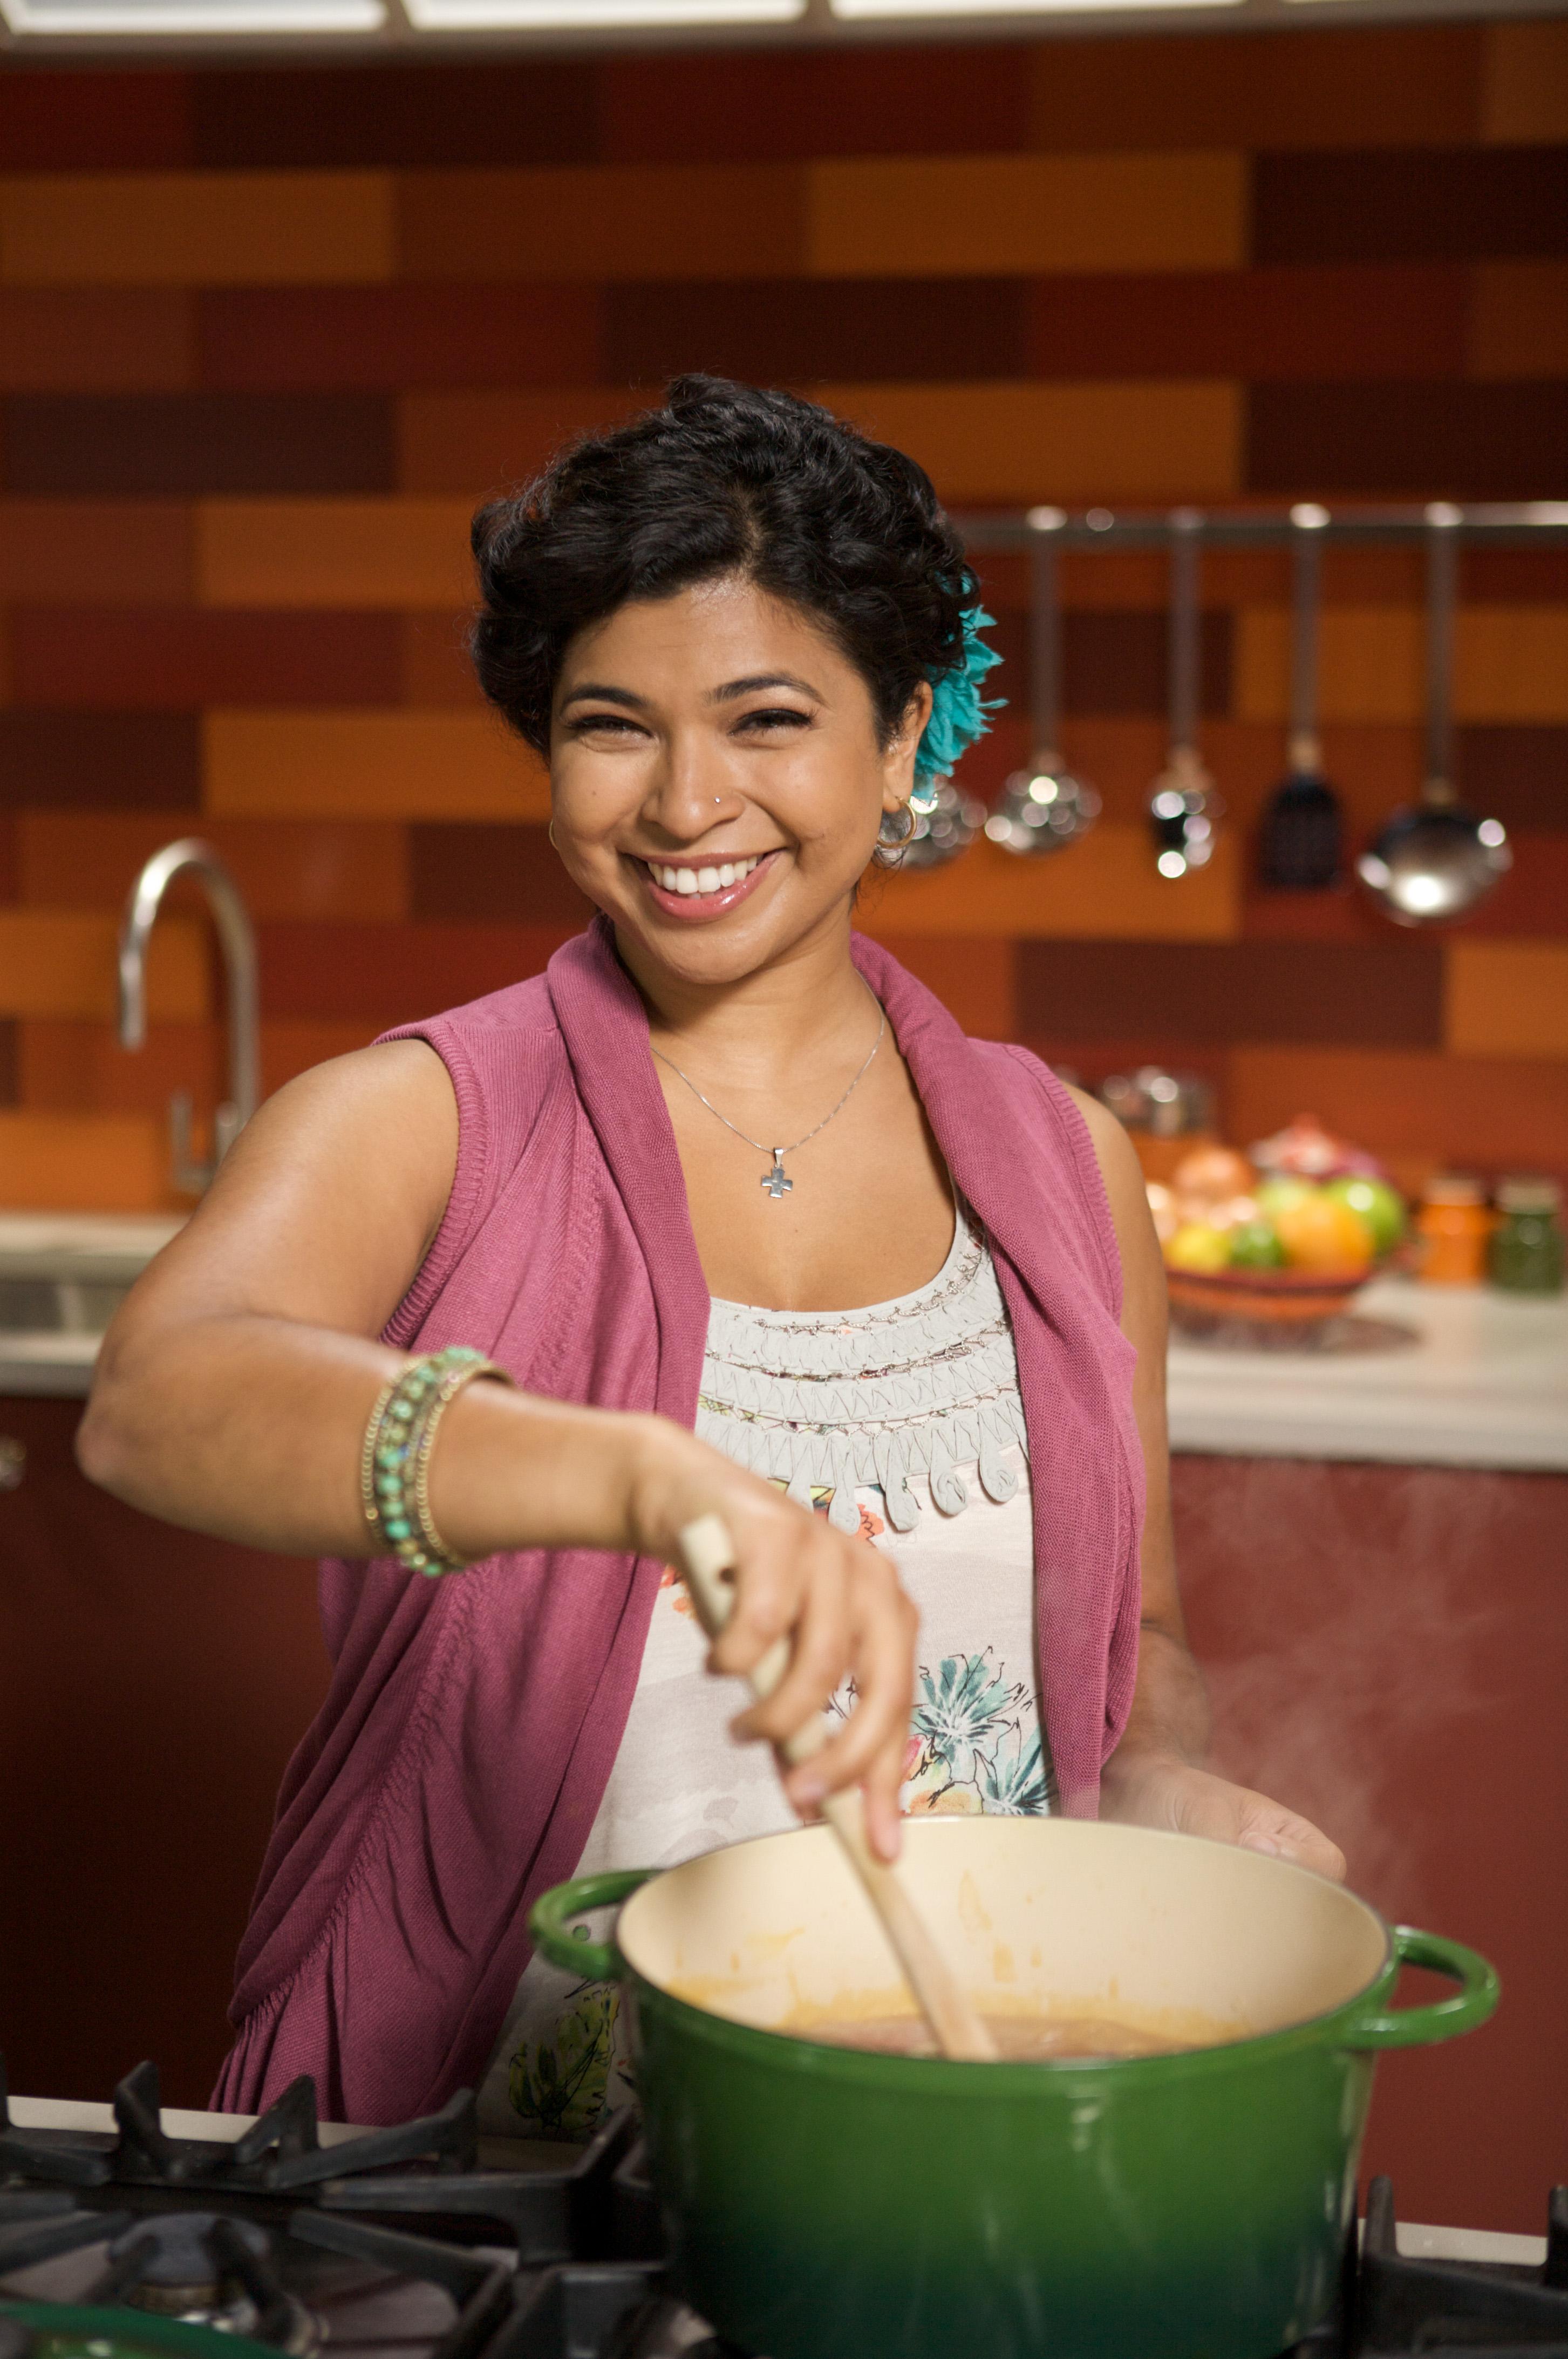 Aarti Sequeira Recipes Food Tv aarti sequeira